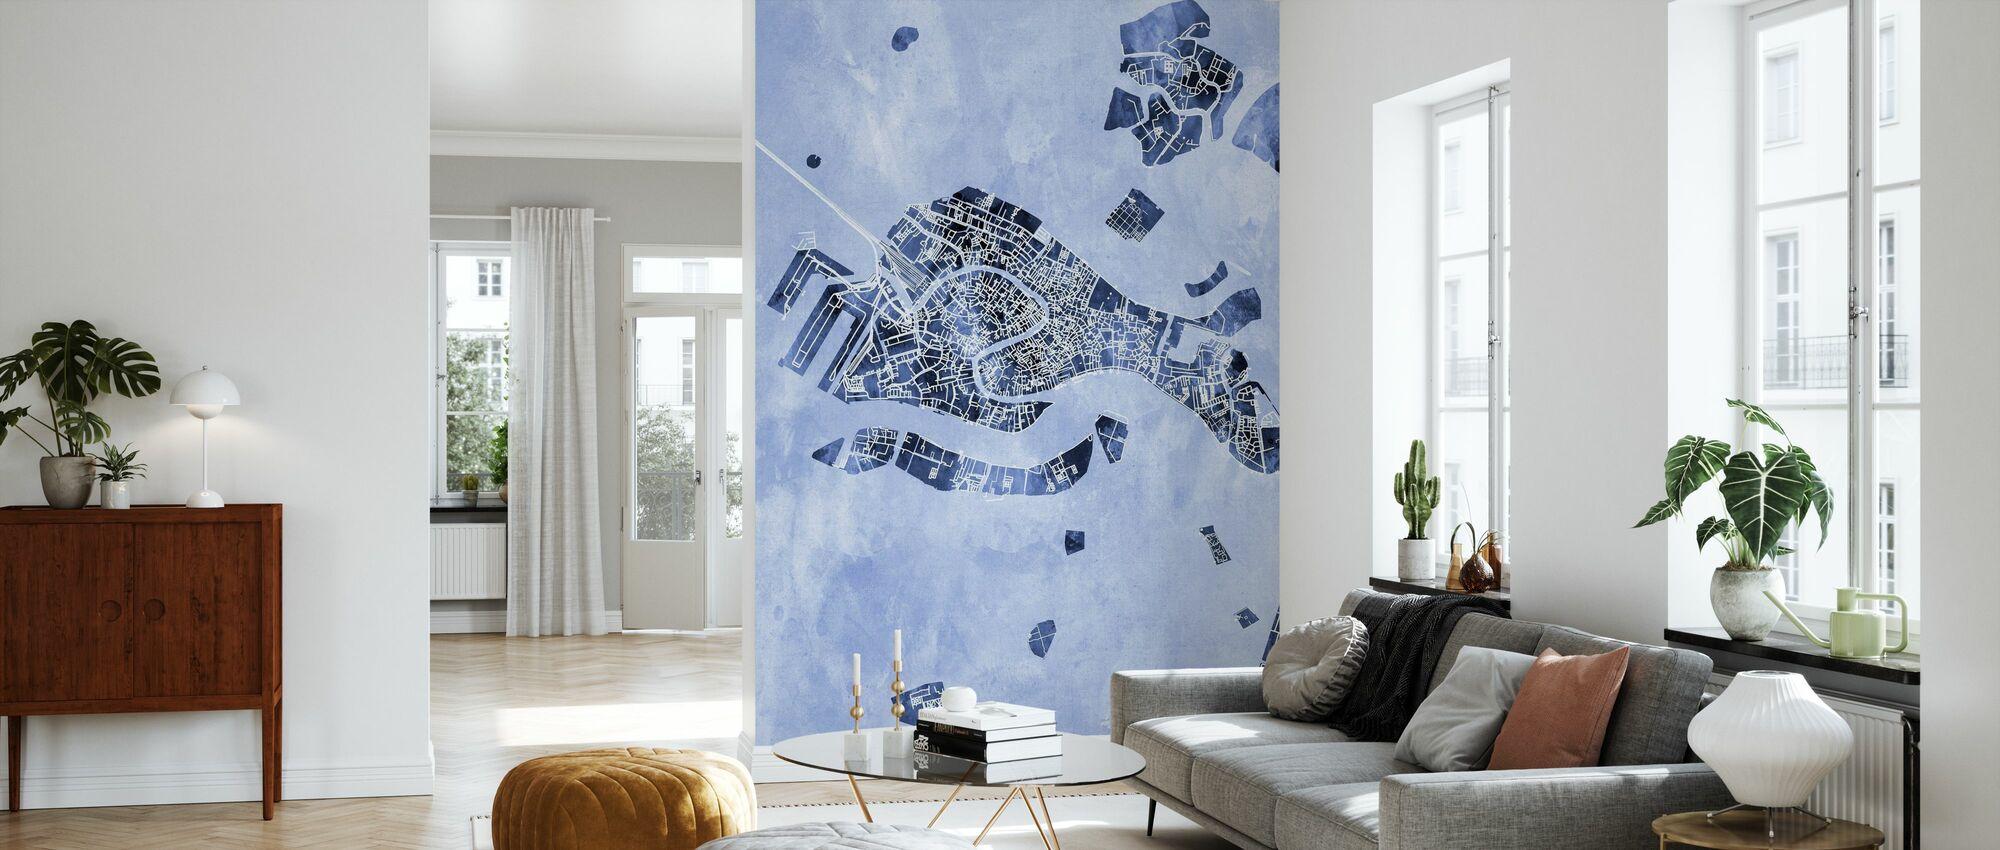 Venice Italy City Map - Wallpaper - Living Room